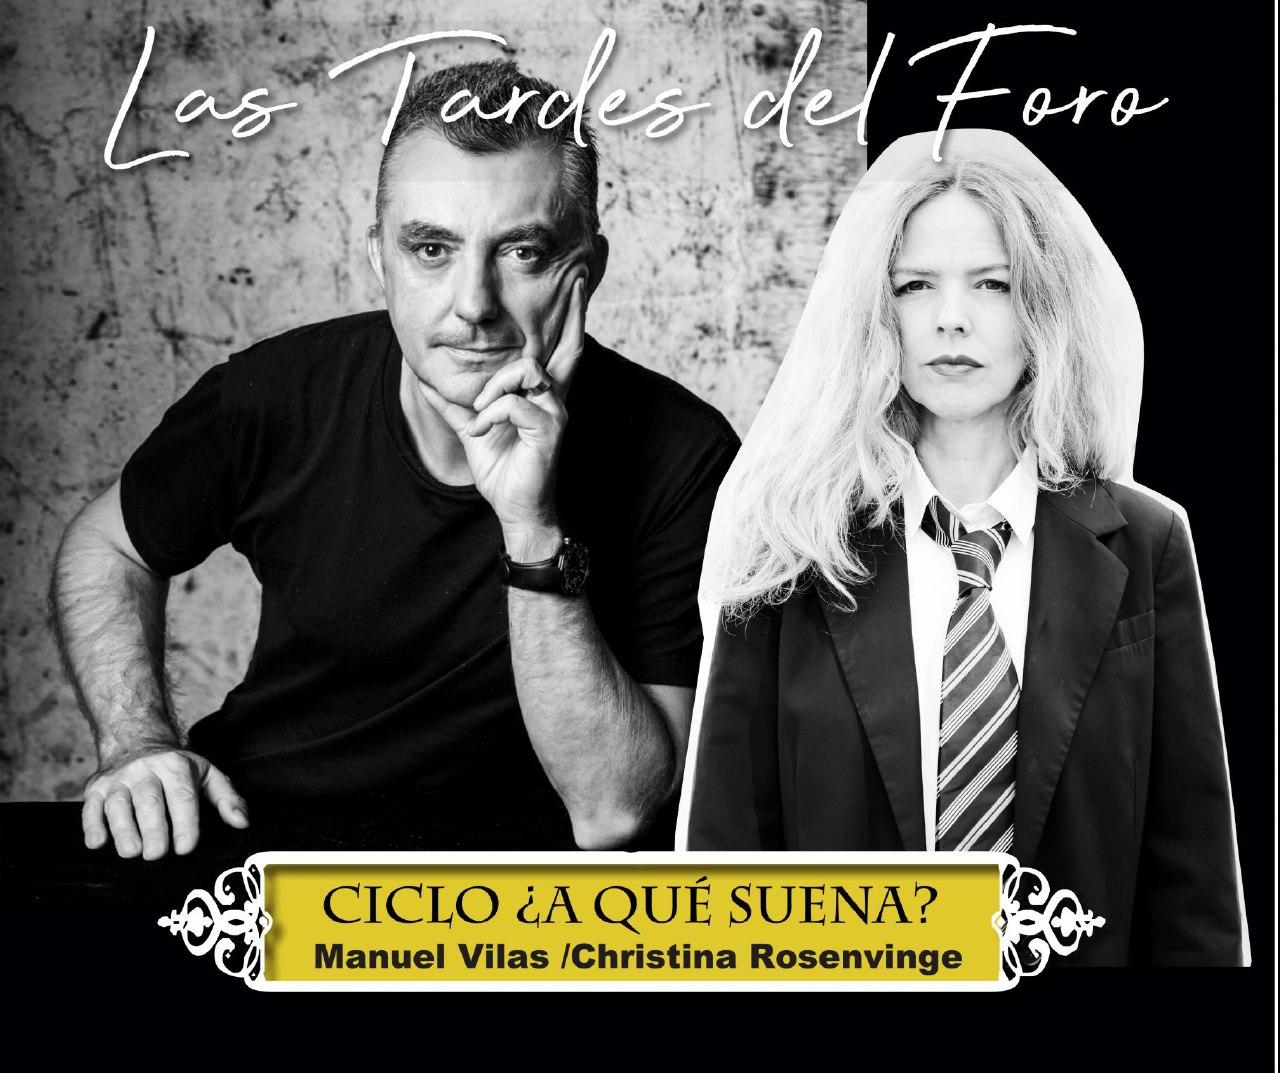 MANUEL VILAS y CHRISTINA ROSENVINGE Foro Iberoamericano de la Rábida las tardes octubre 2020